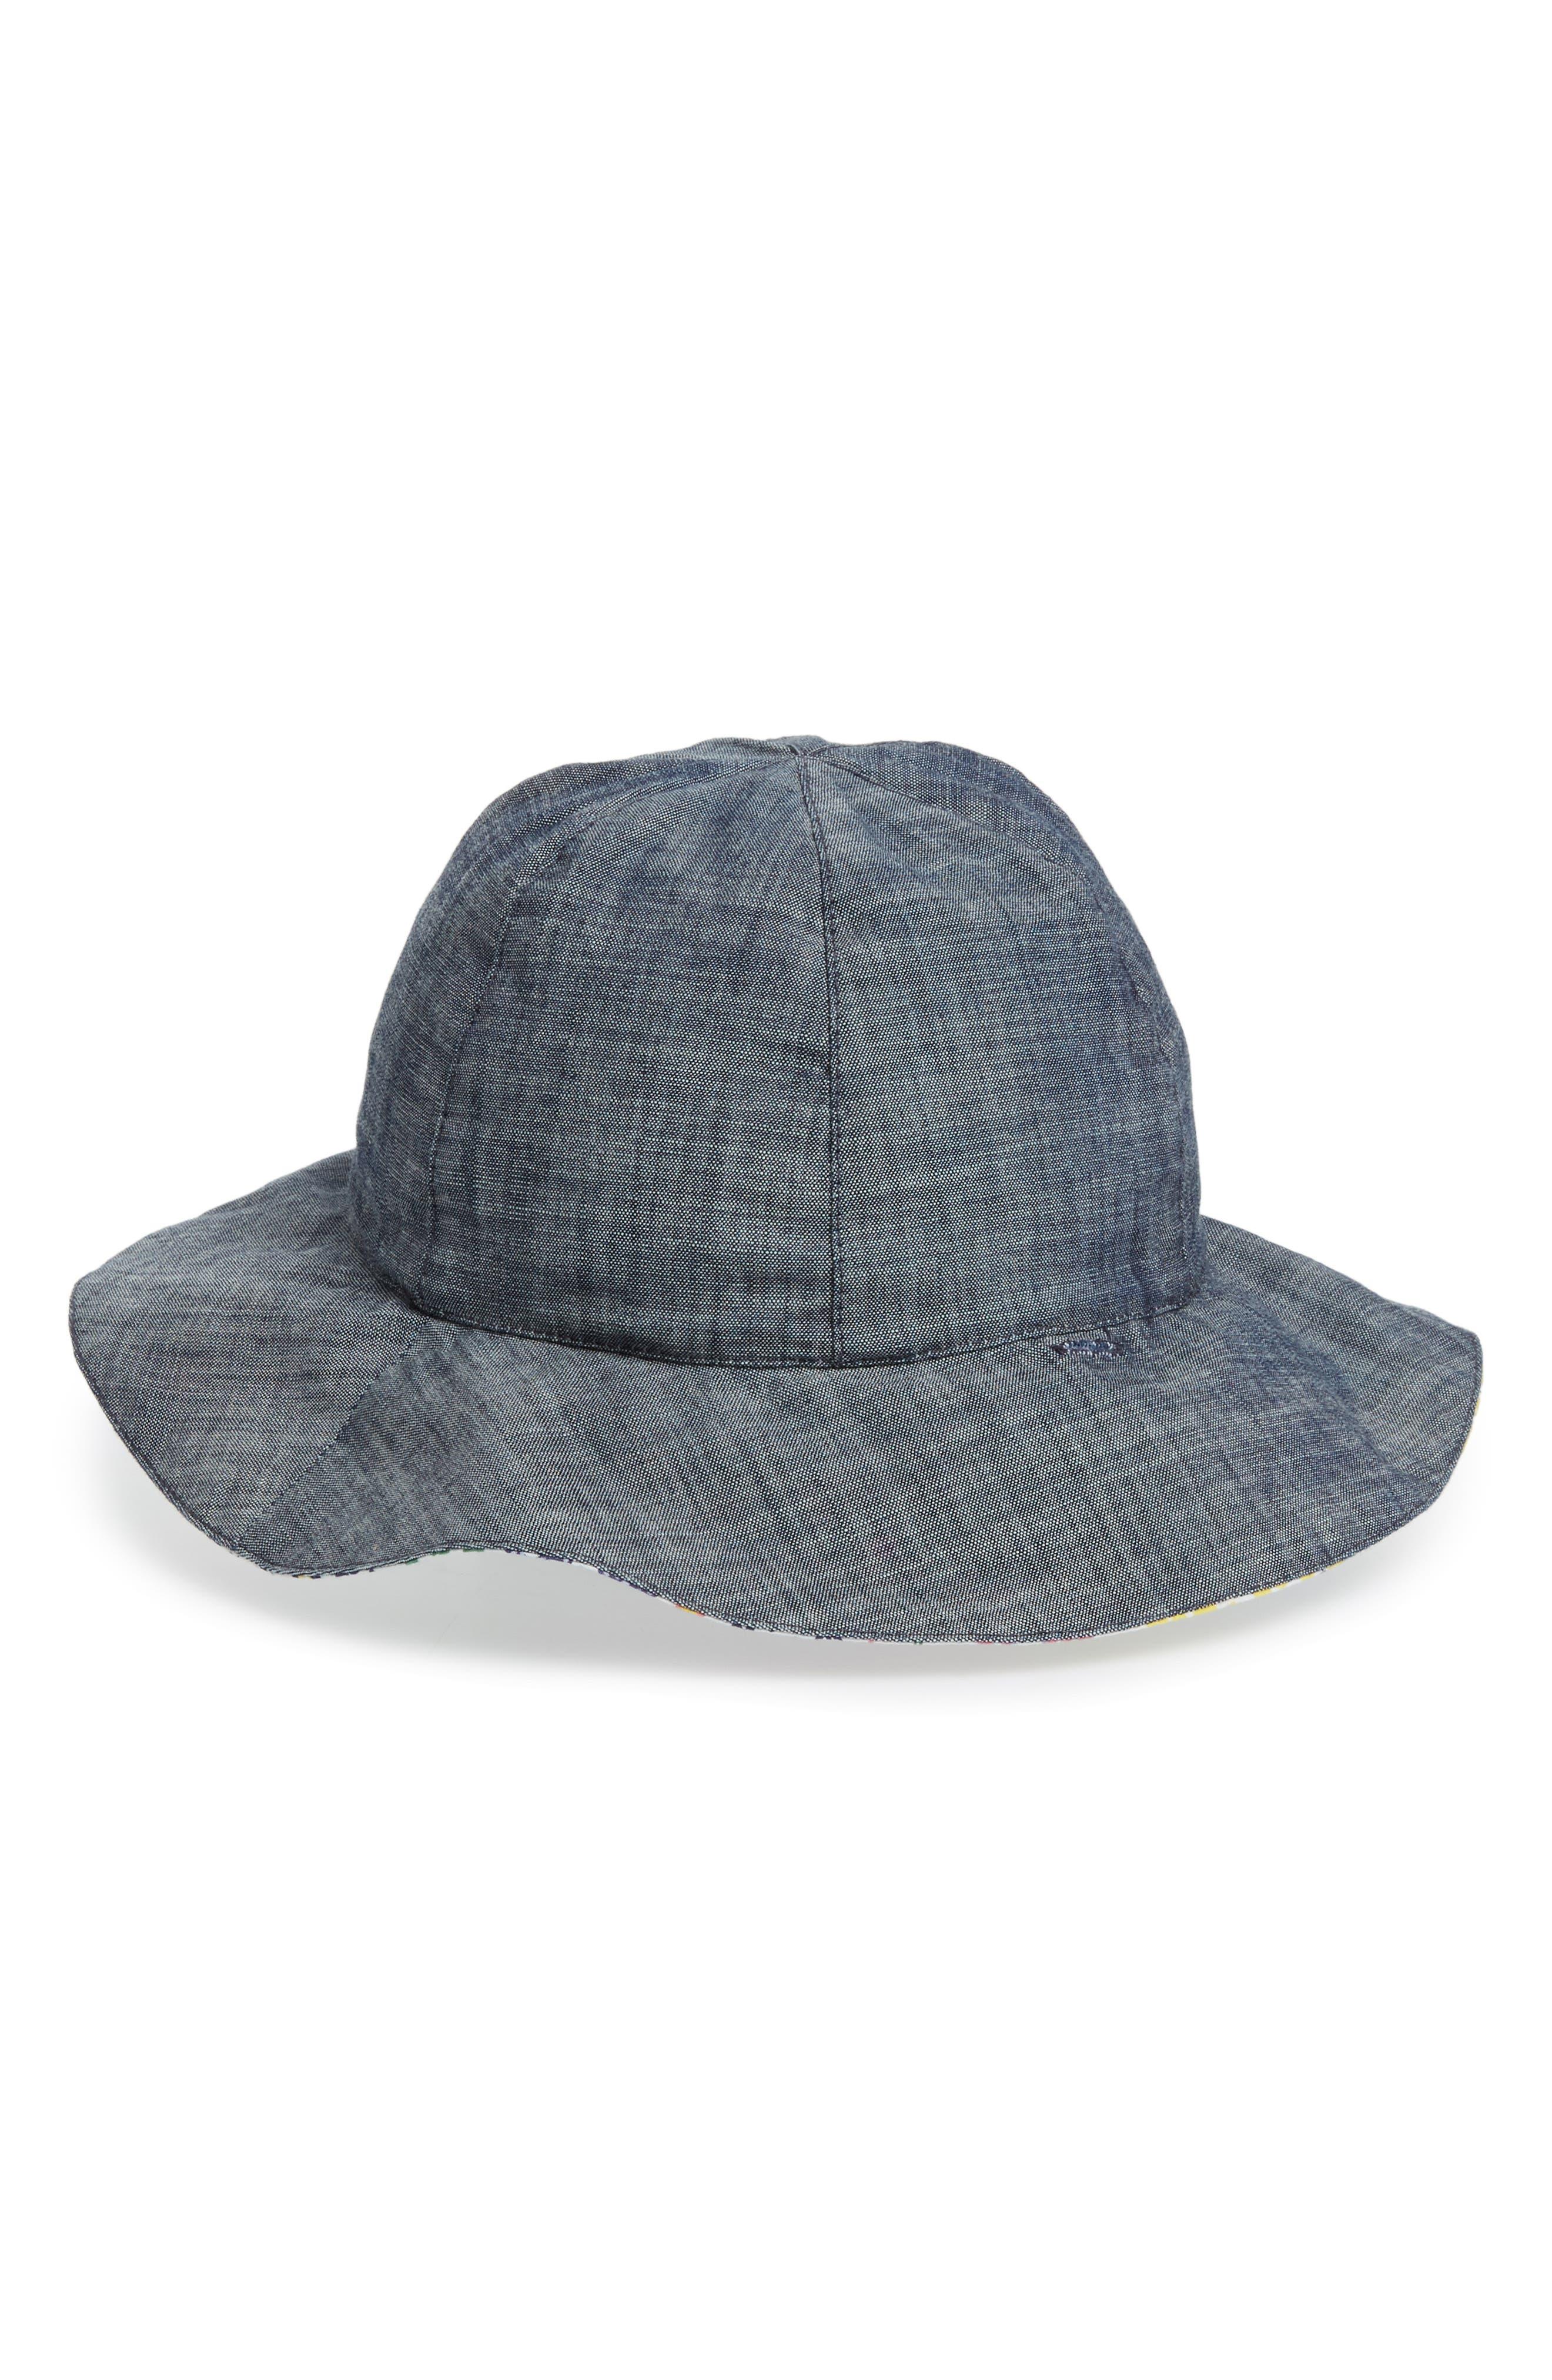 Reversible Sun Hat,                         Main,                         color, WHITE MULTI MEADOW